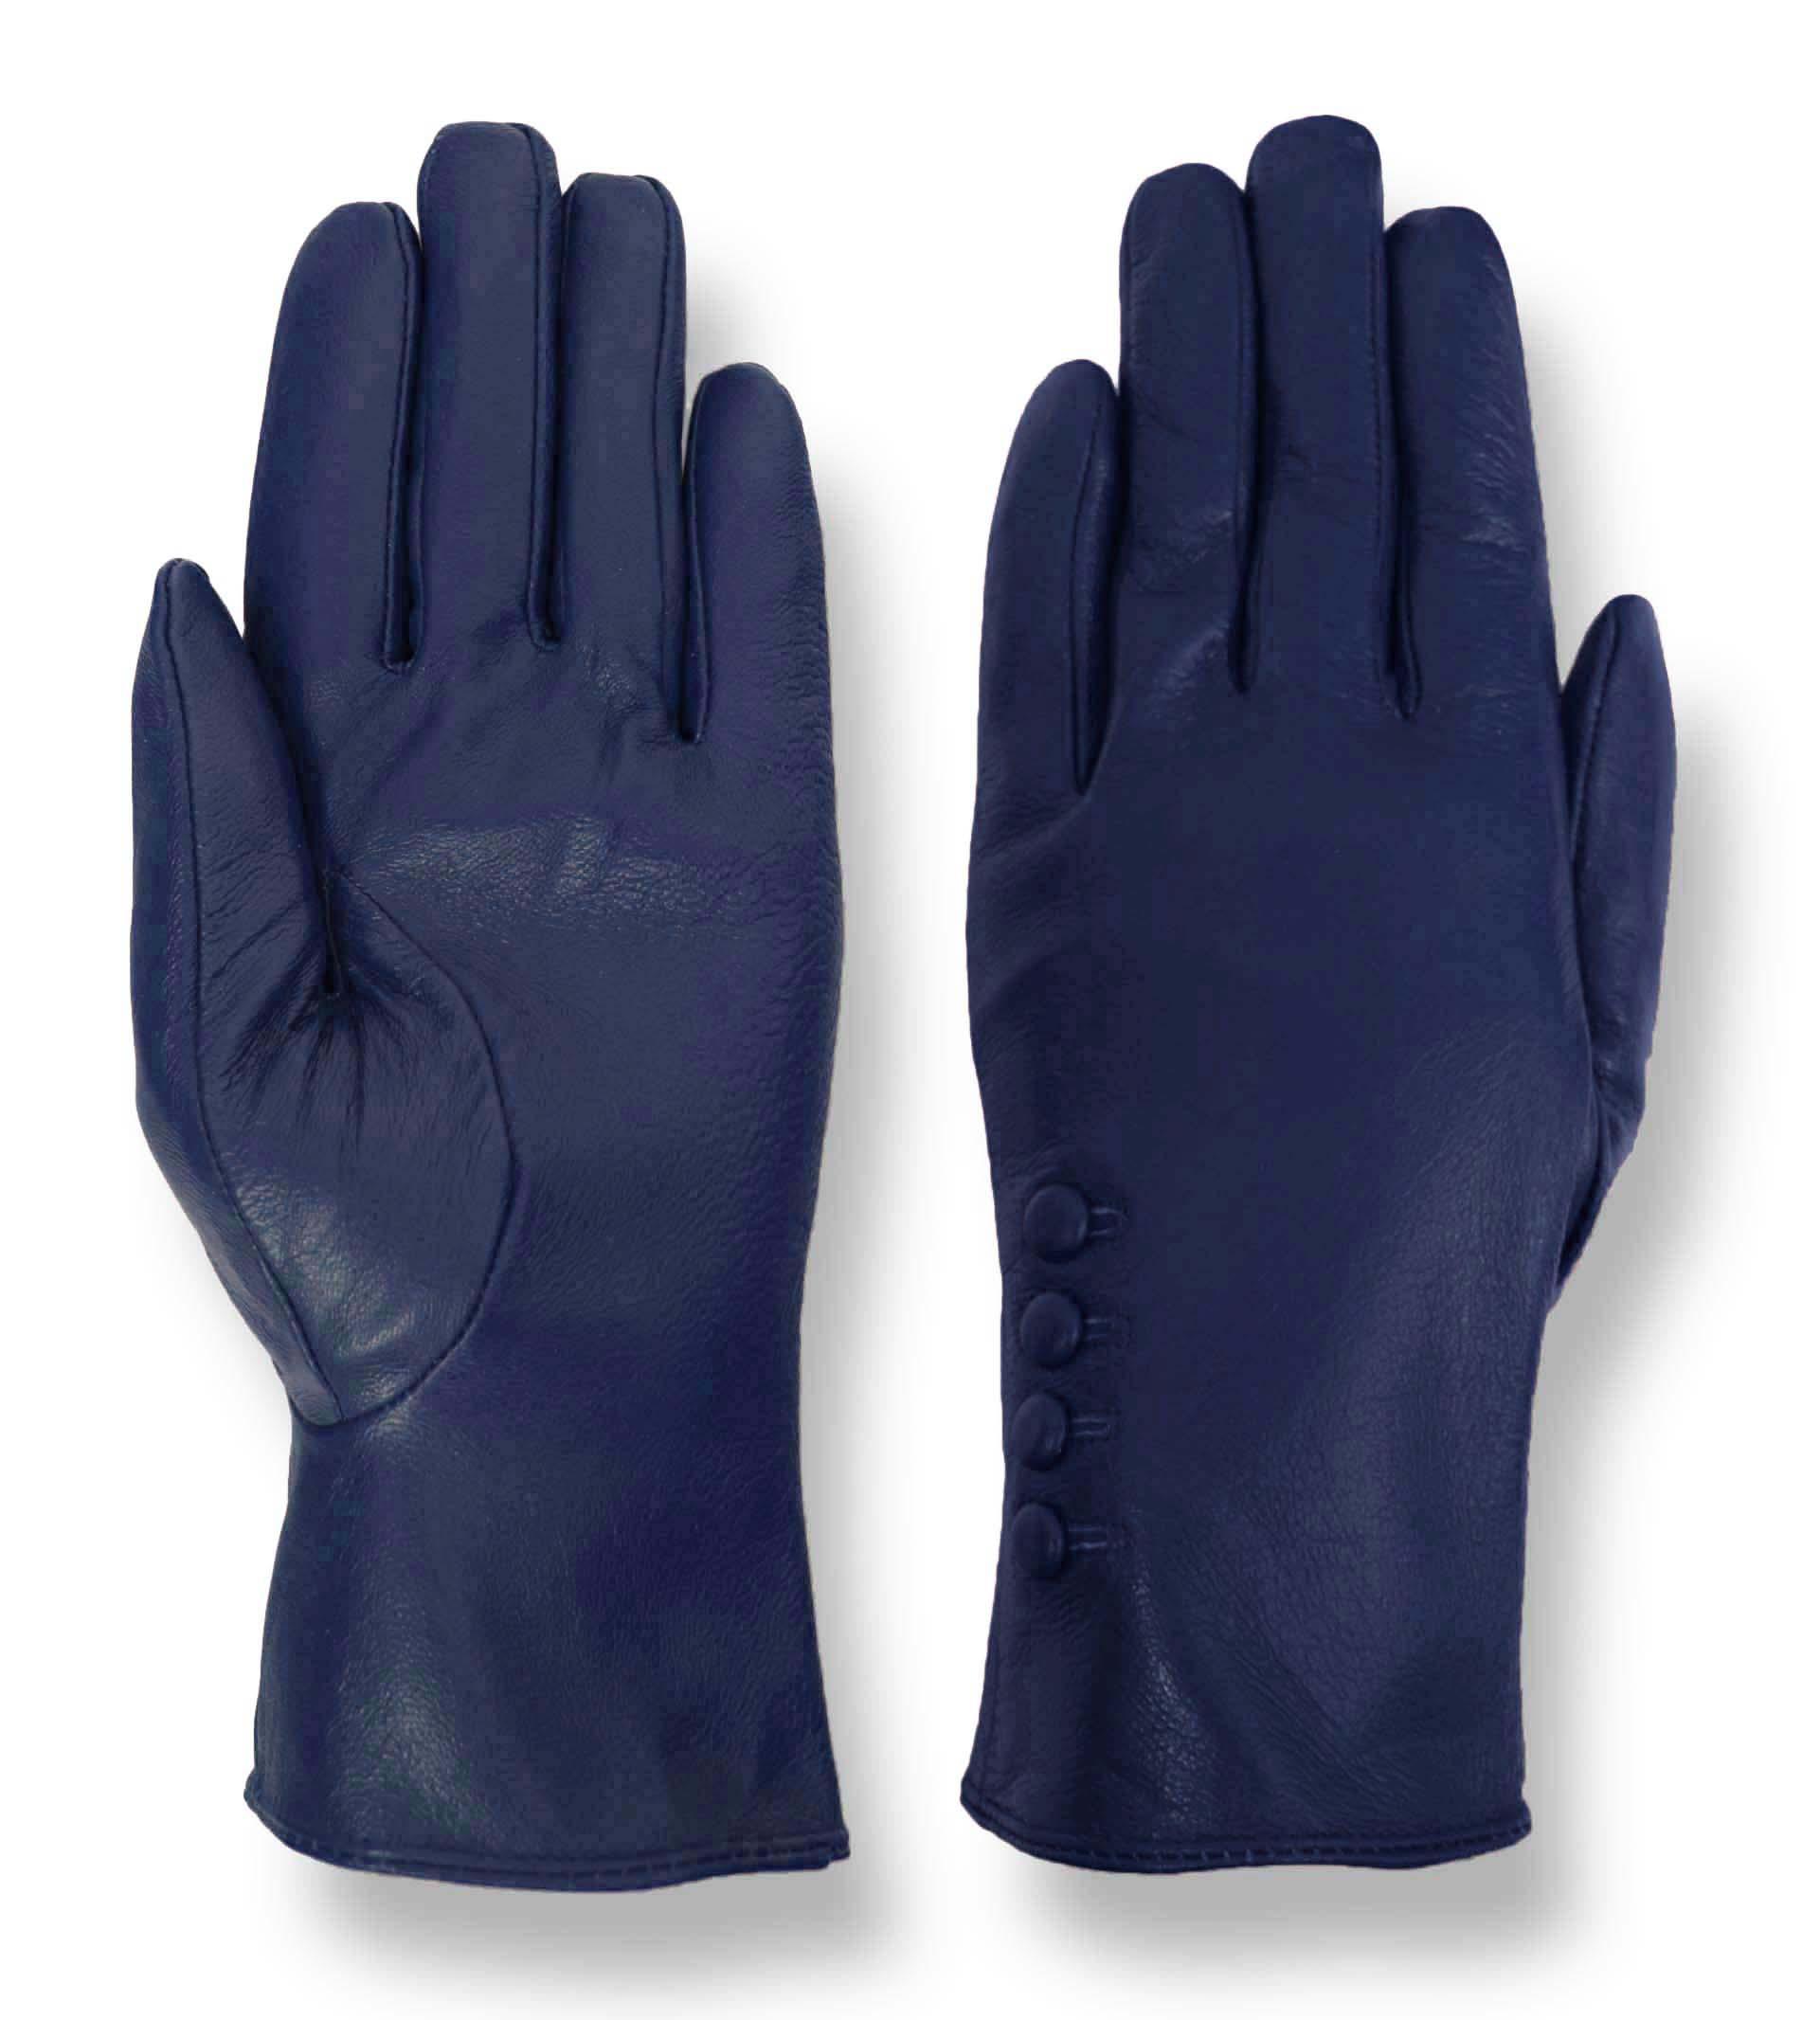 Blue leather driving gloves - Giromy Samoni Women S Plush Lined 4 Button Dress Leather Driving Gloves Blue